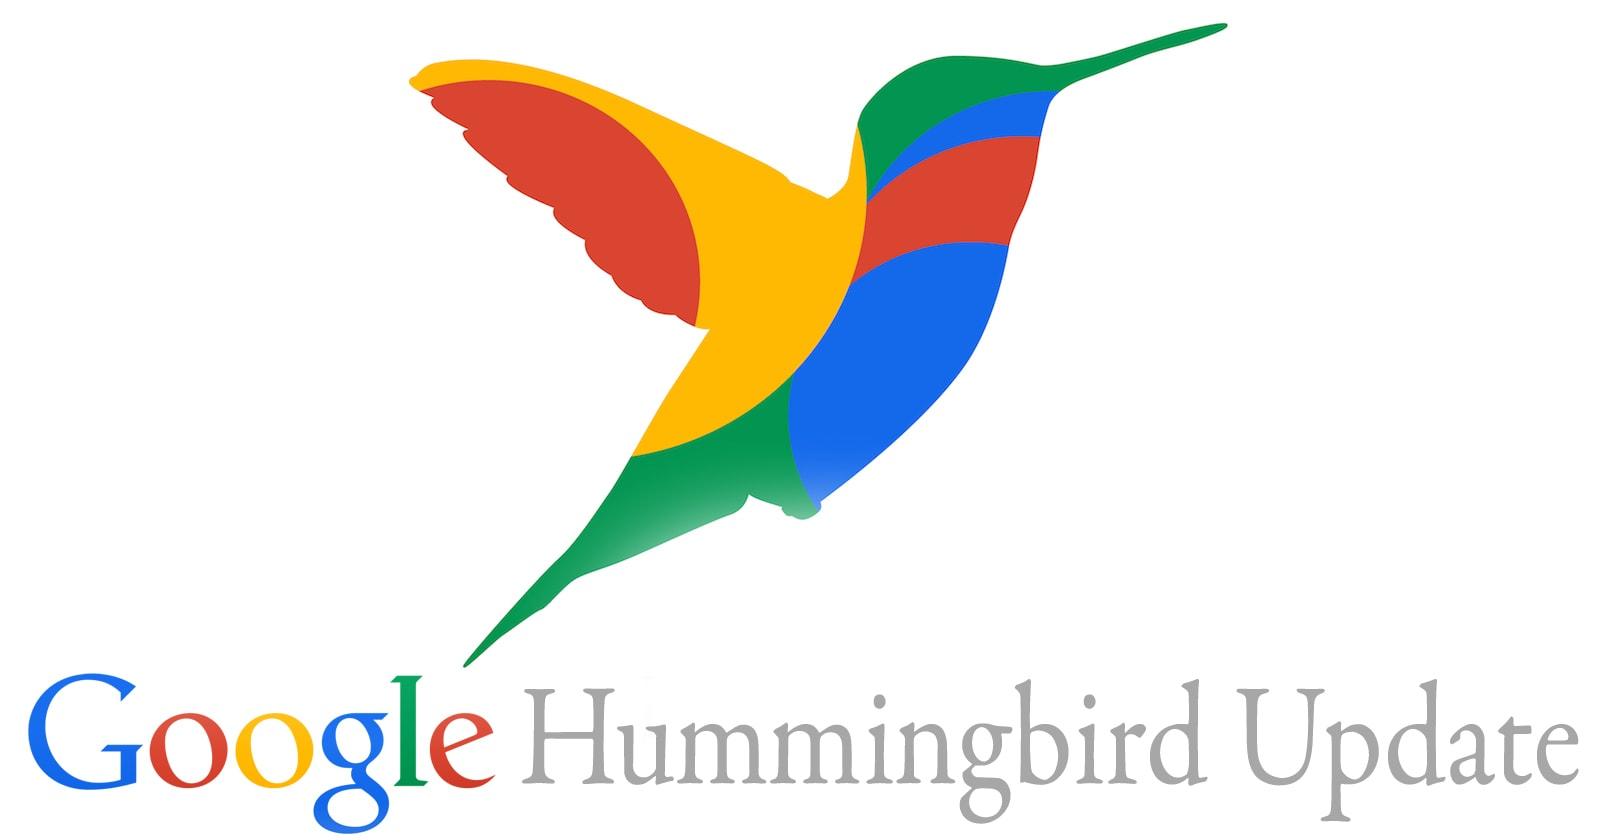 Google hummingbird update and user intent